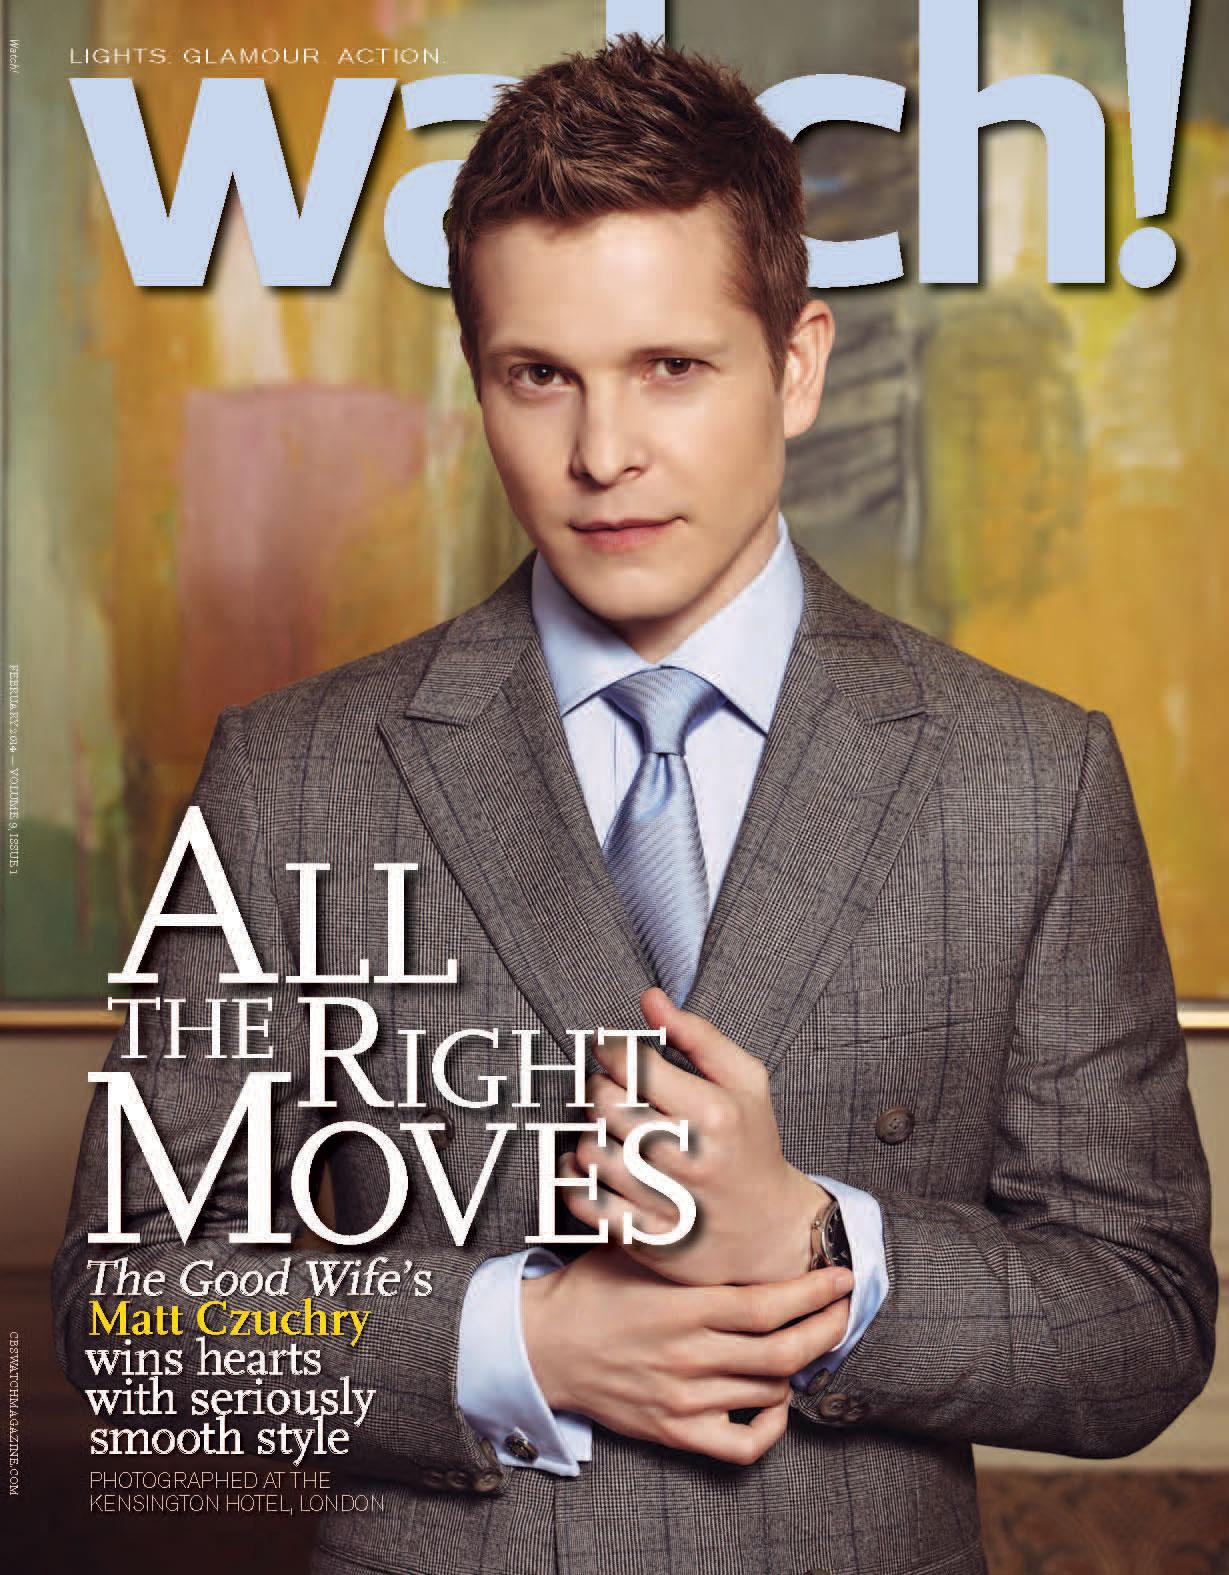 The Good Wife's Matt Czuchry Watch Magazine Cover